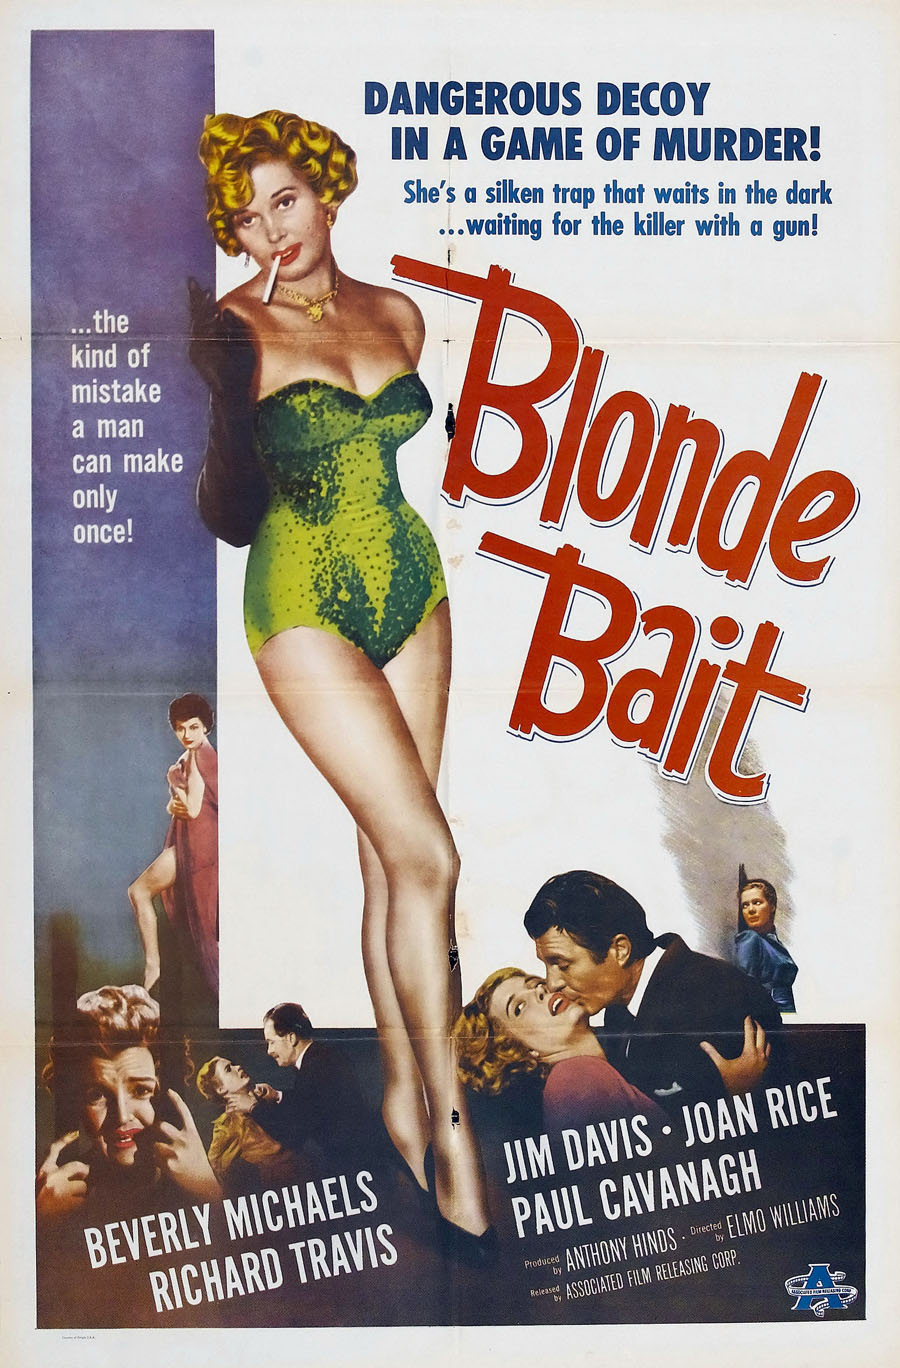 Blonde Bait  - Poster (1956)